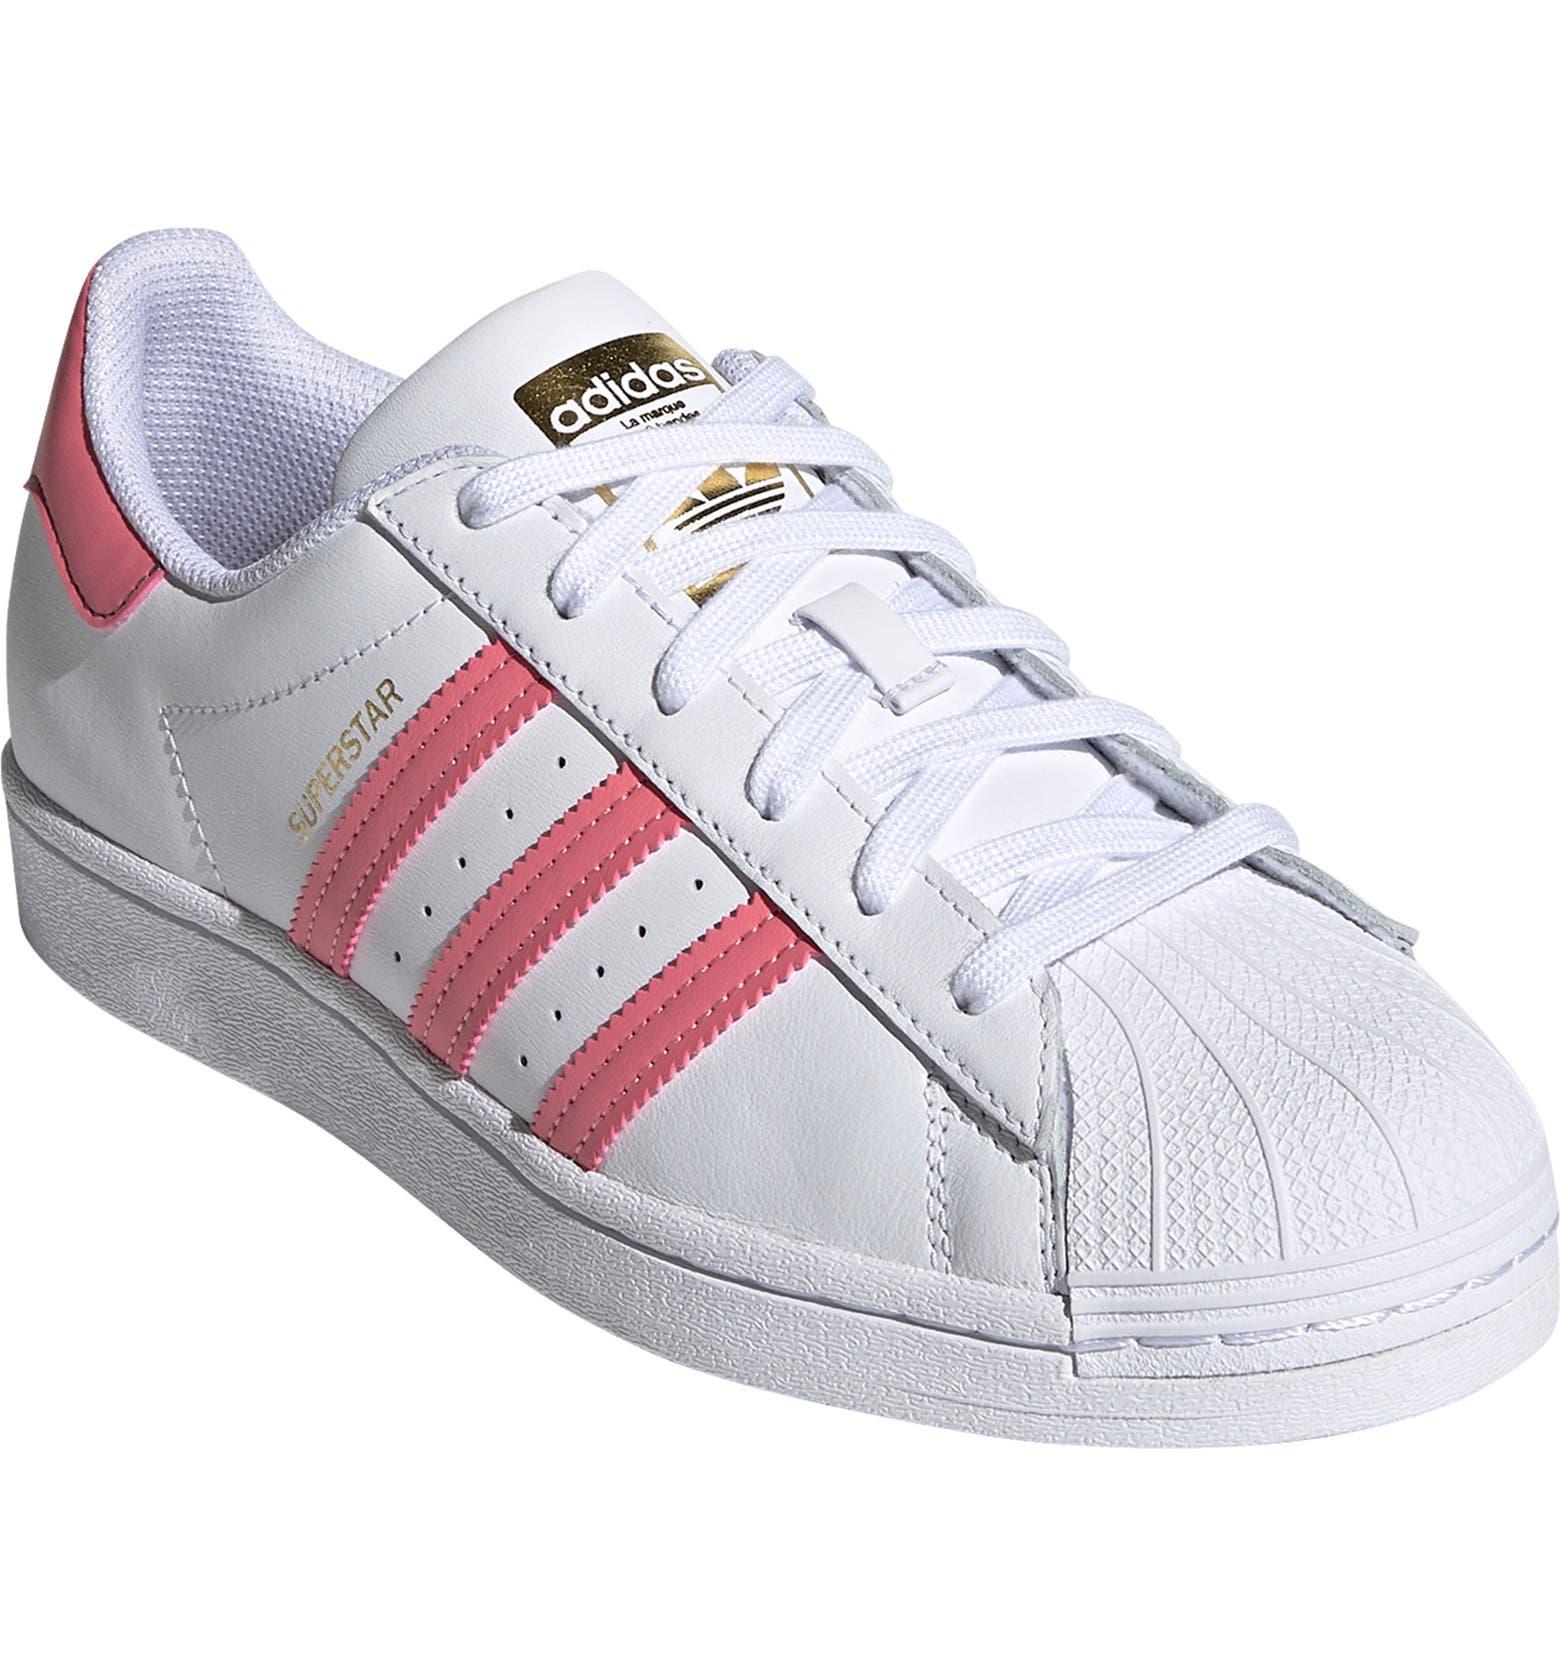 tenis zapato Adidas superstar rosa